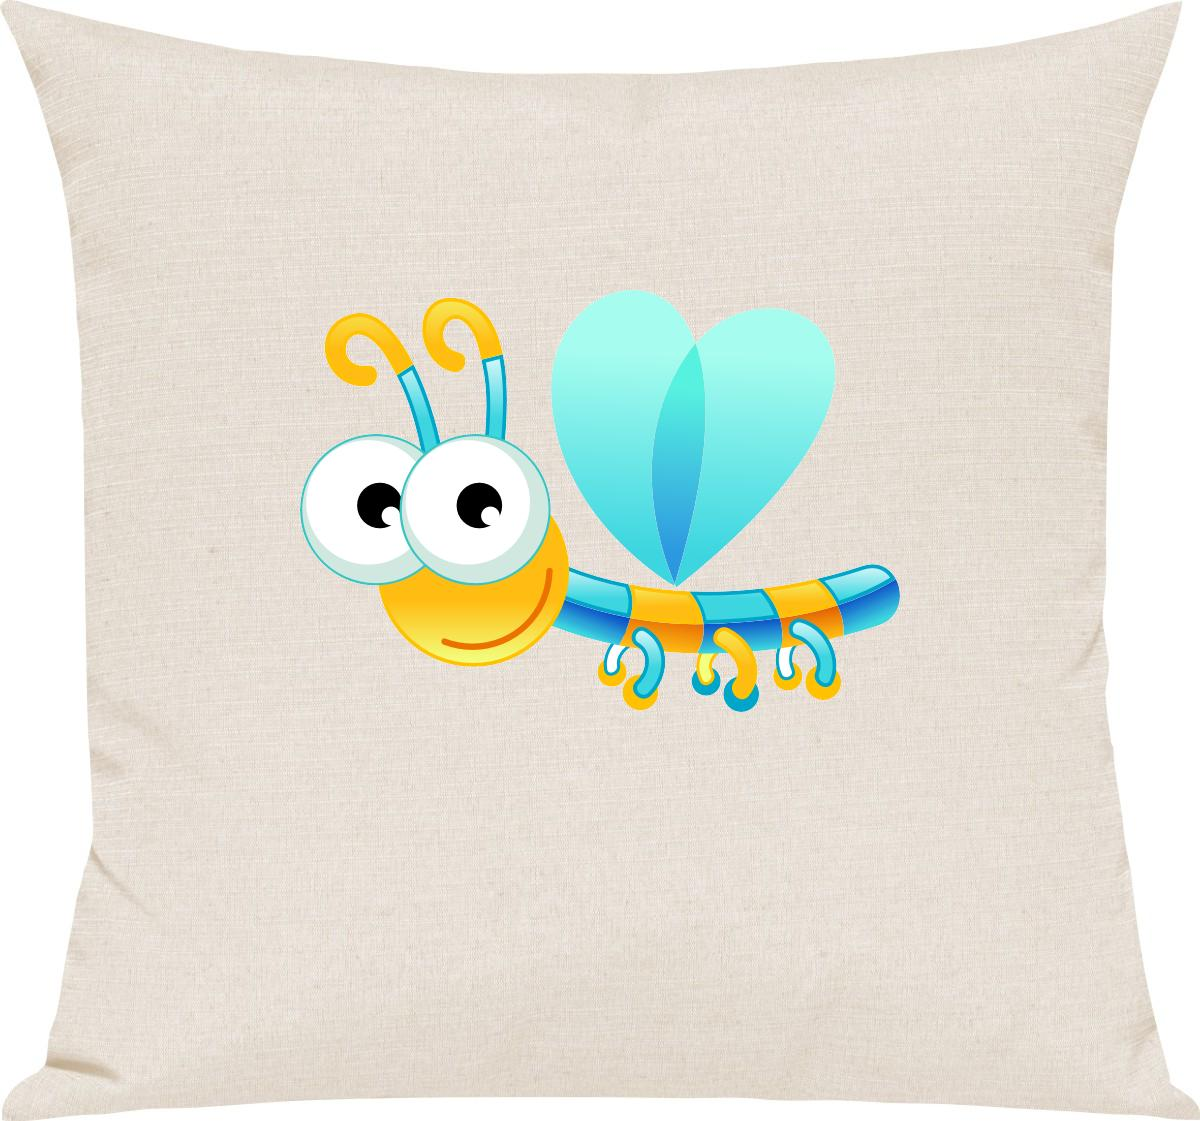 Indexbild 4 - Kinder Kissen, Libelle Insekt Tiere Tier Natur, Kuschelkissen Couch Deko,